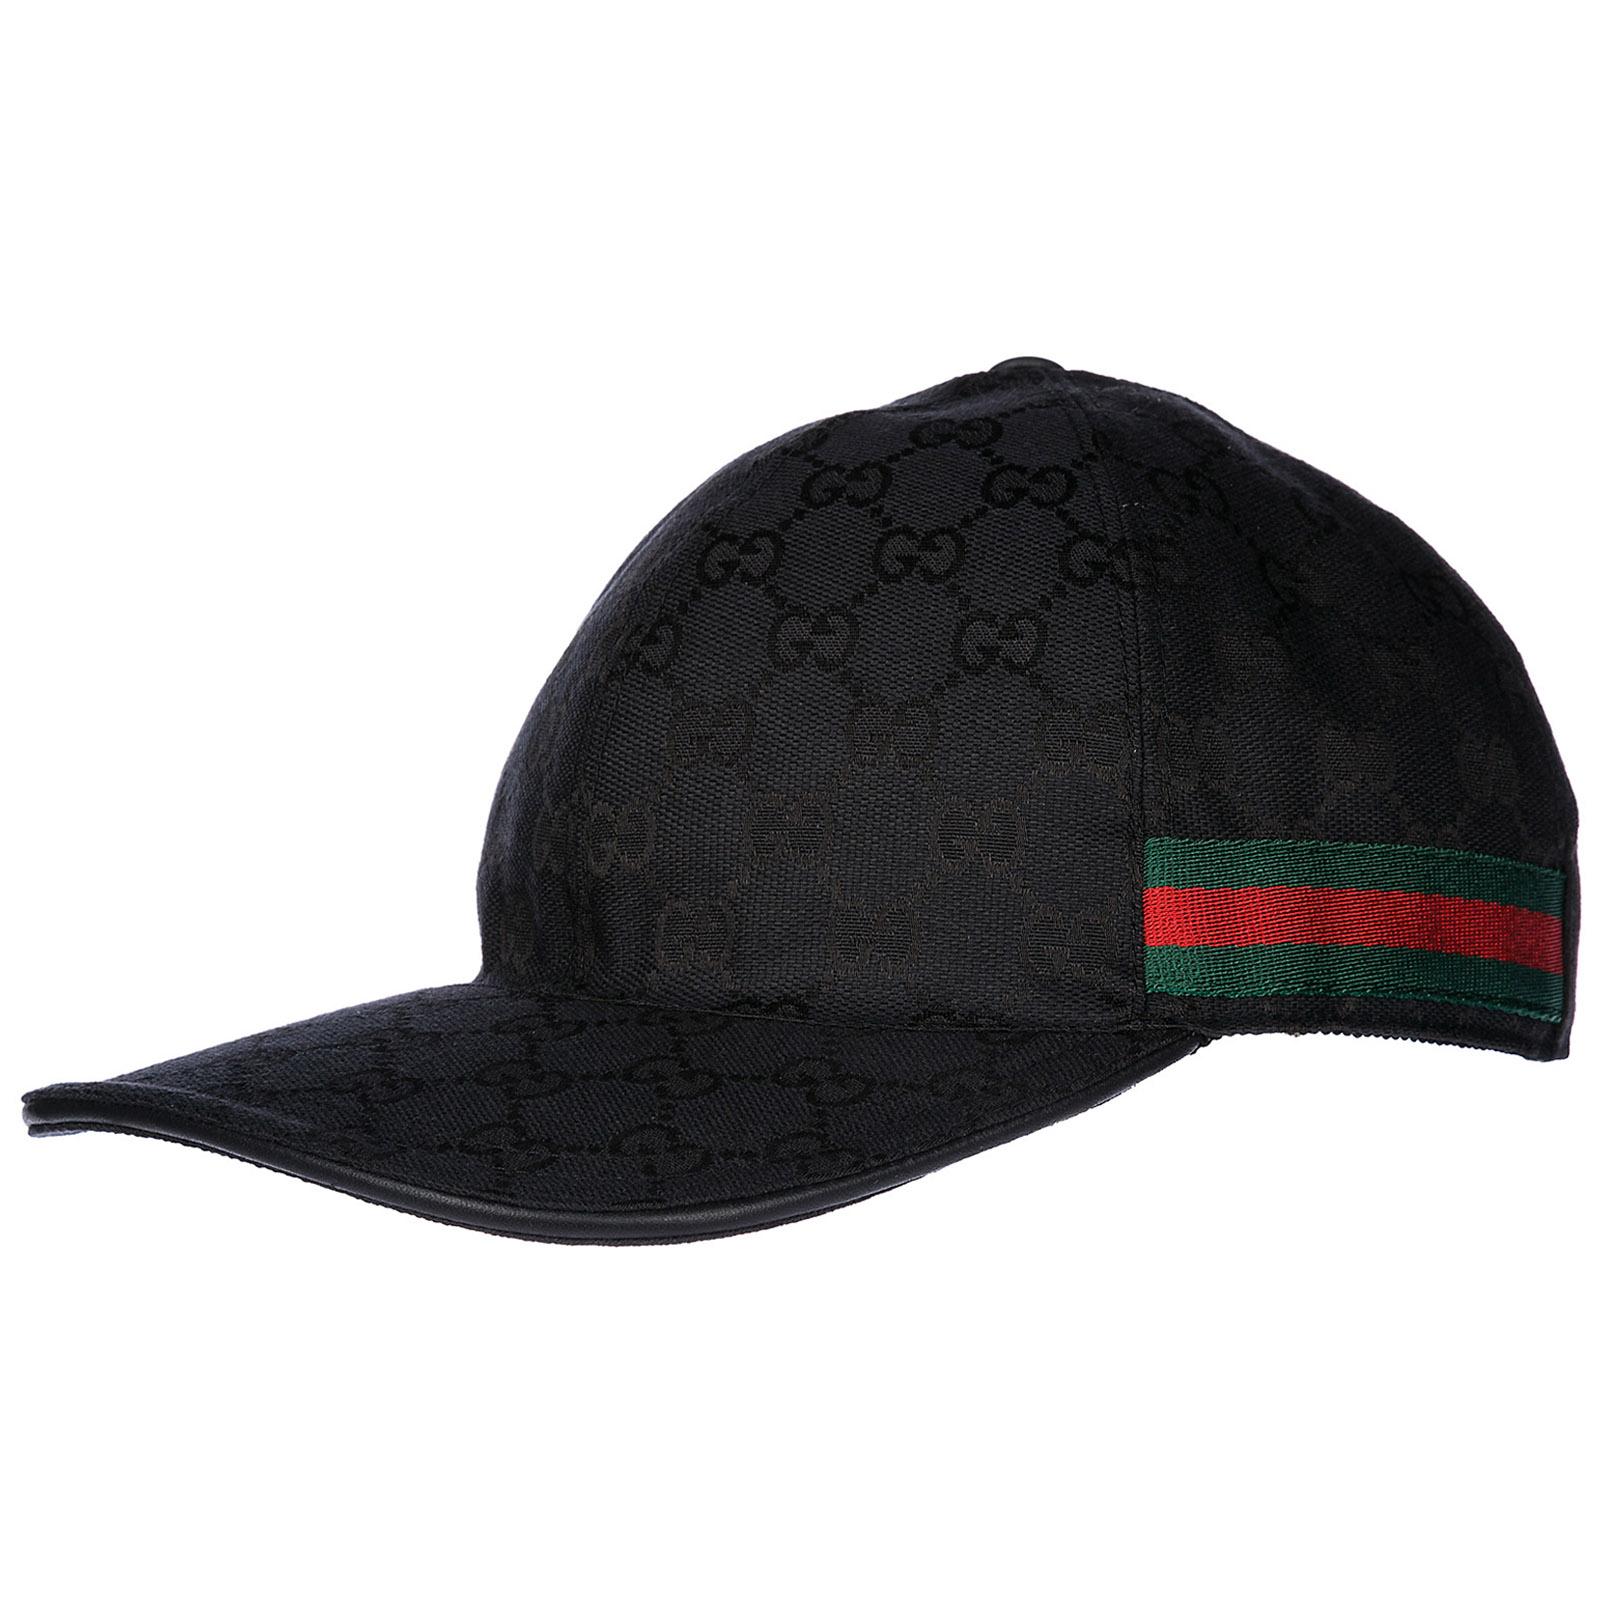 a1989a72b Adjustable men's cotton hat baseball cap